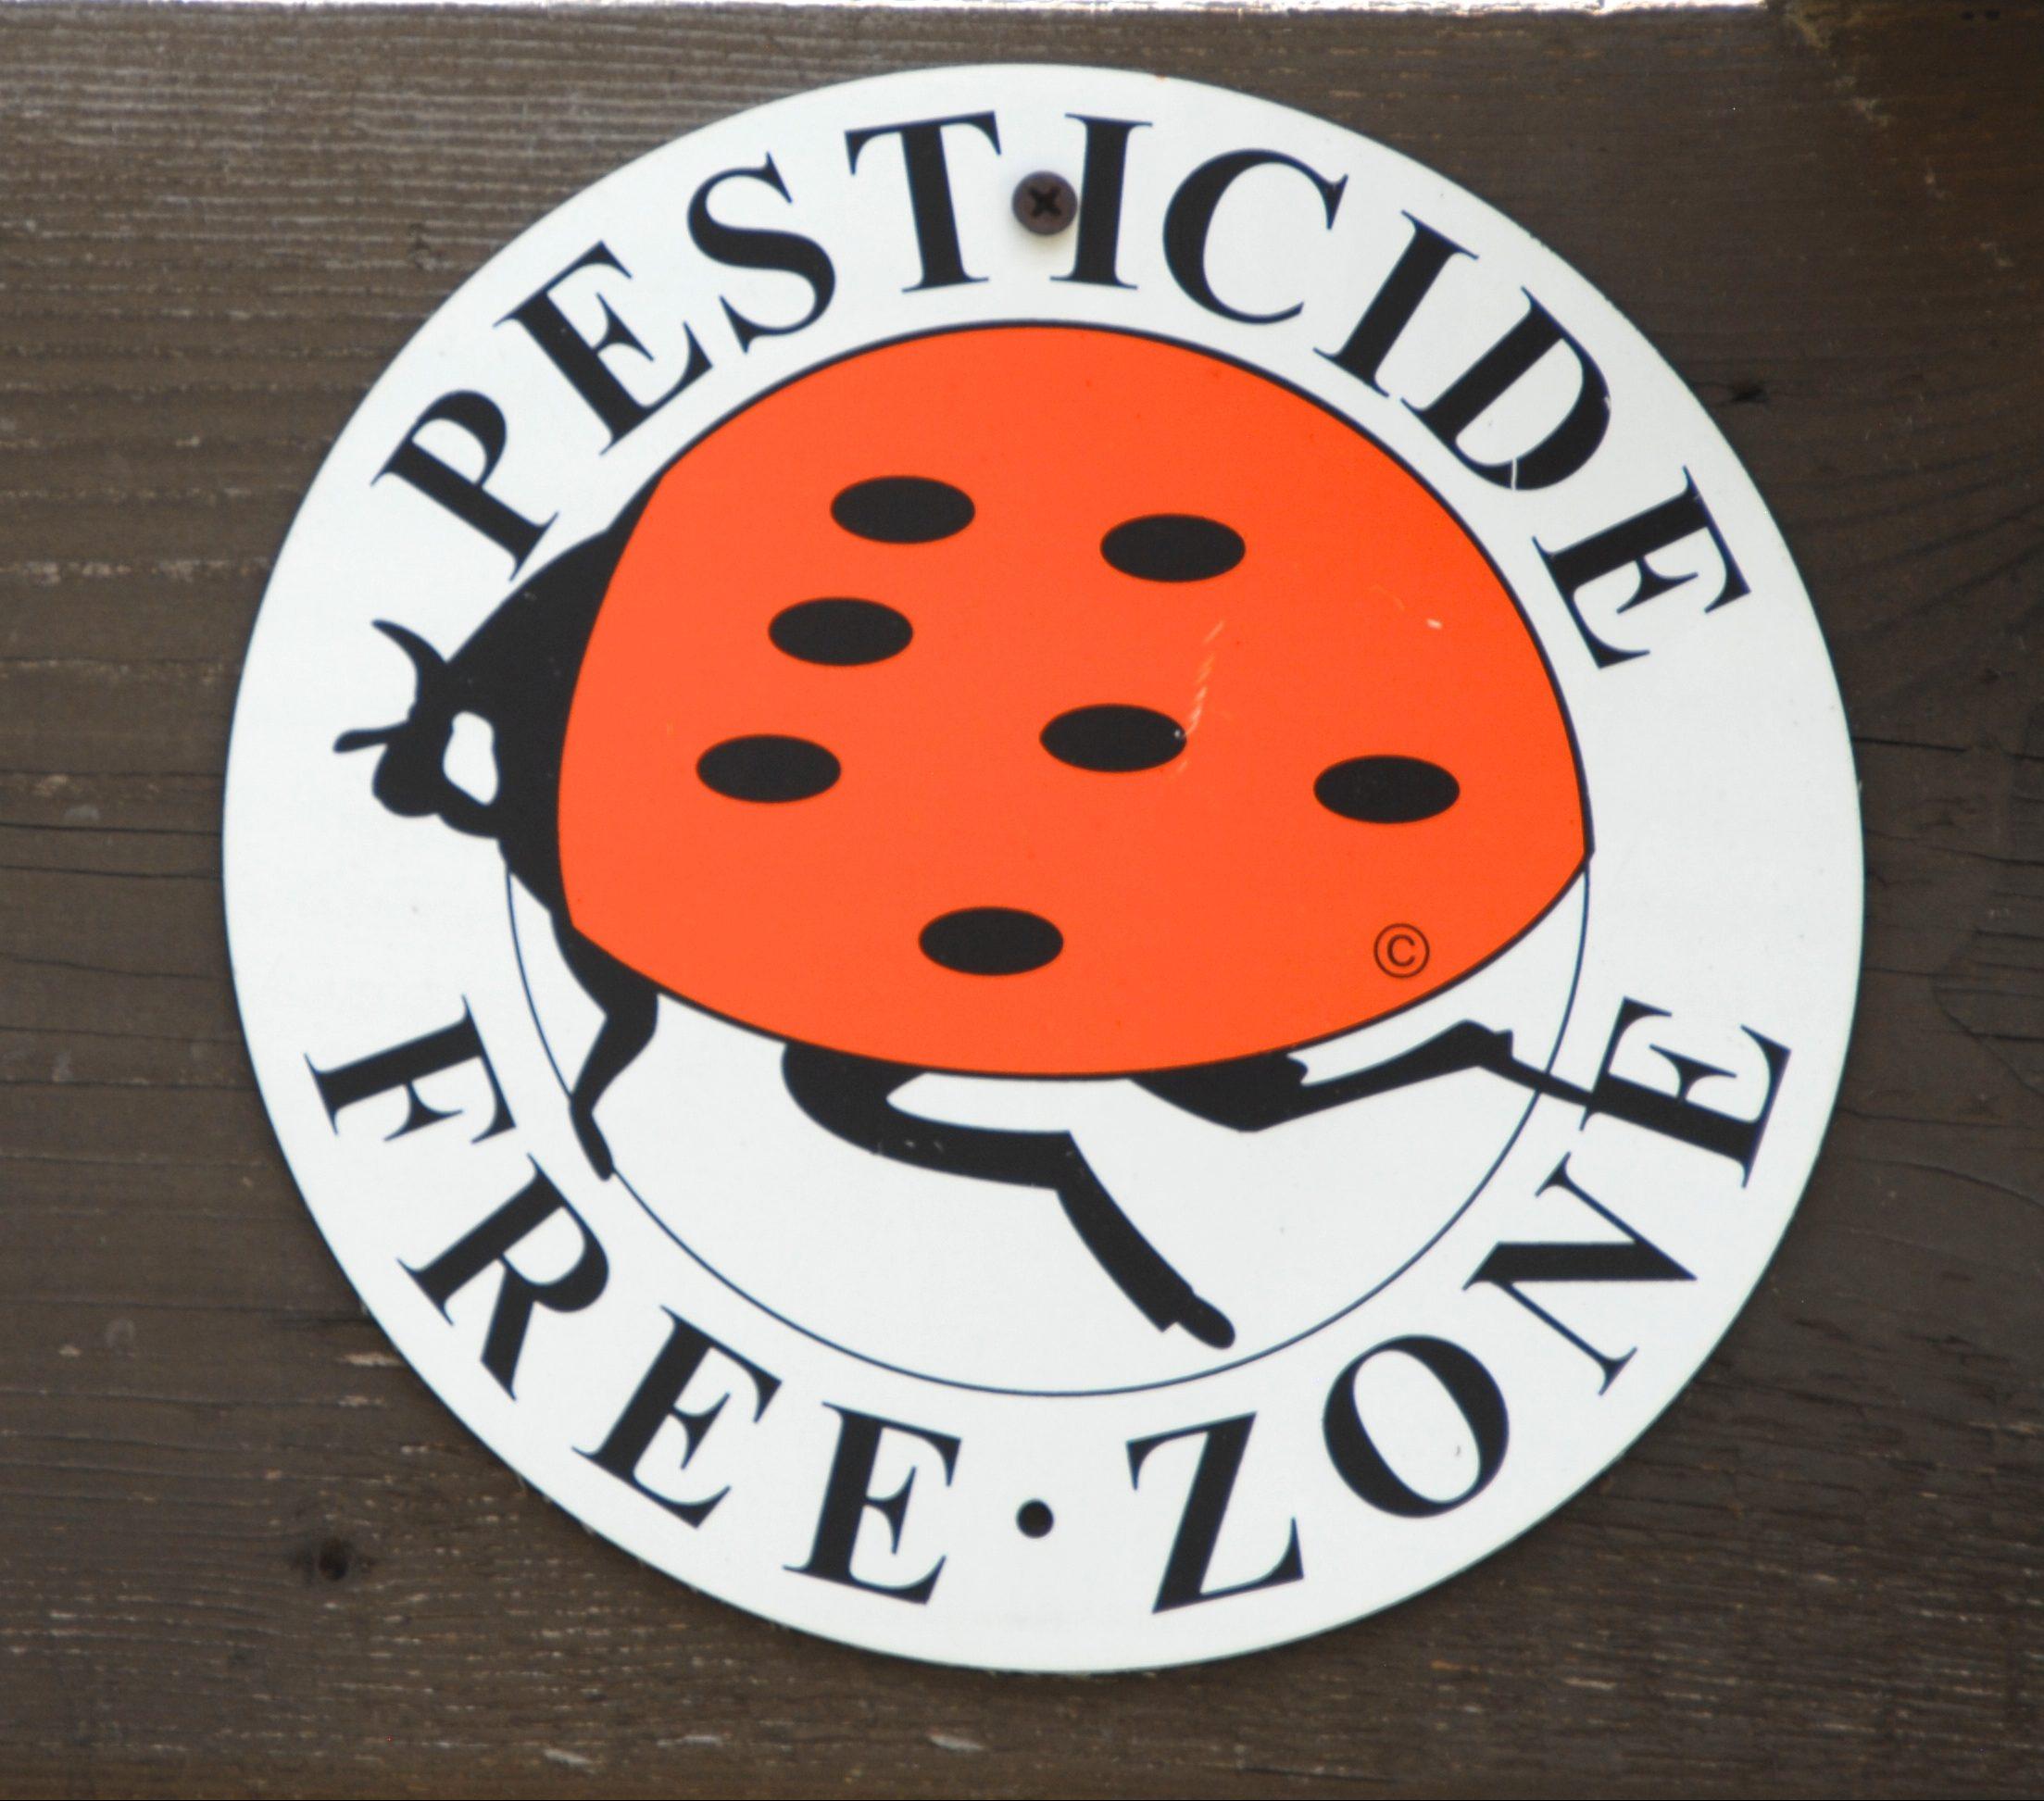 pesticide free zone